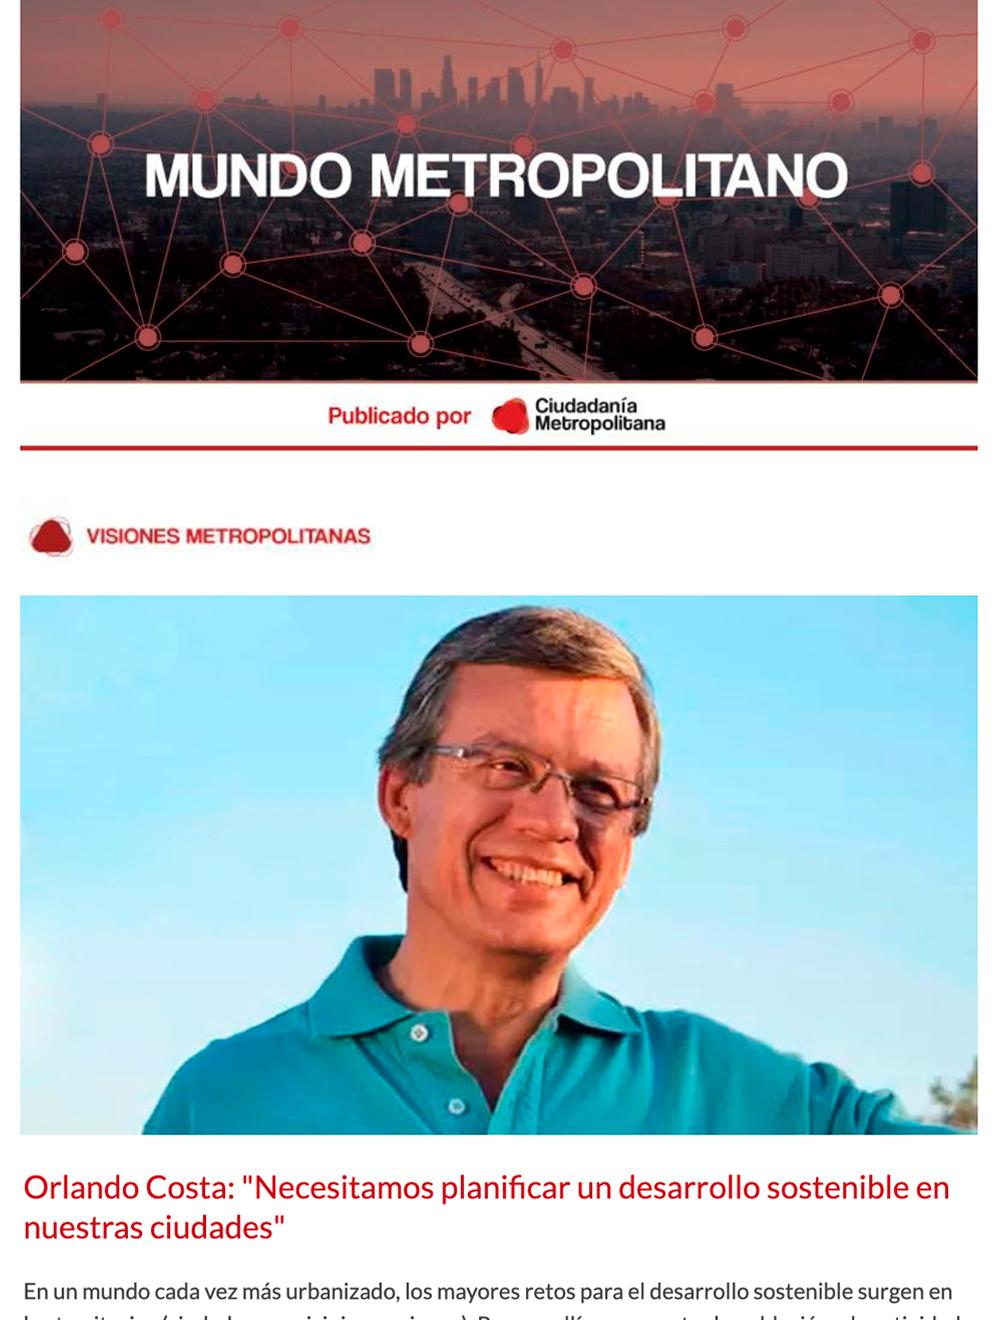 Newsletter Mundo Metropolitano 6